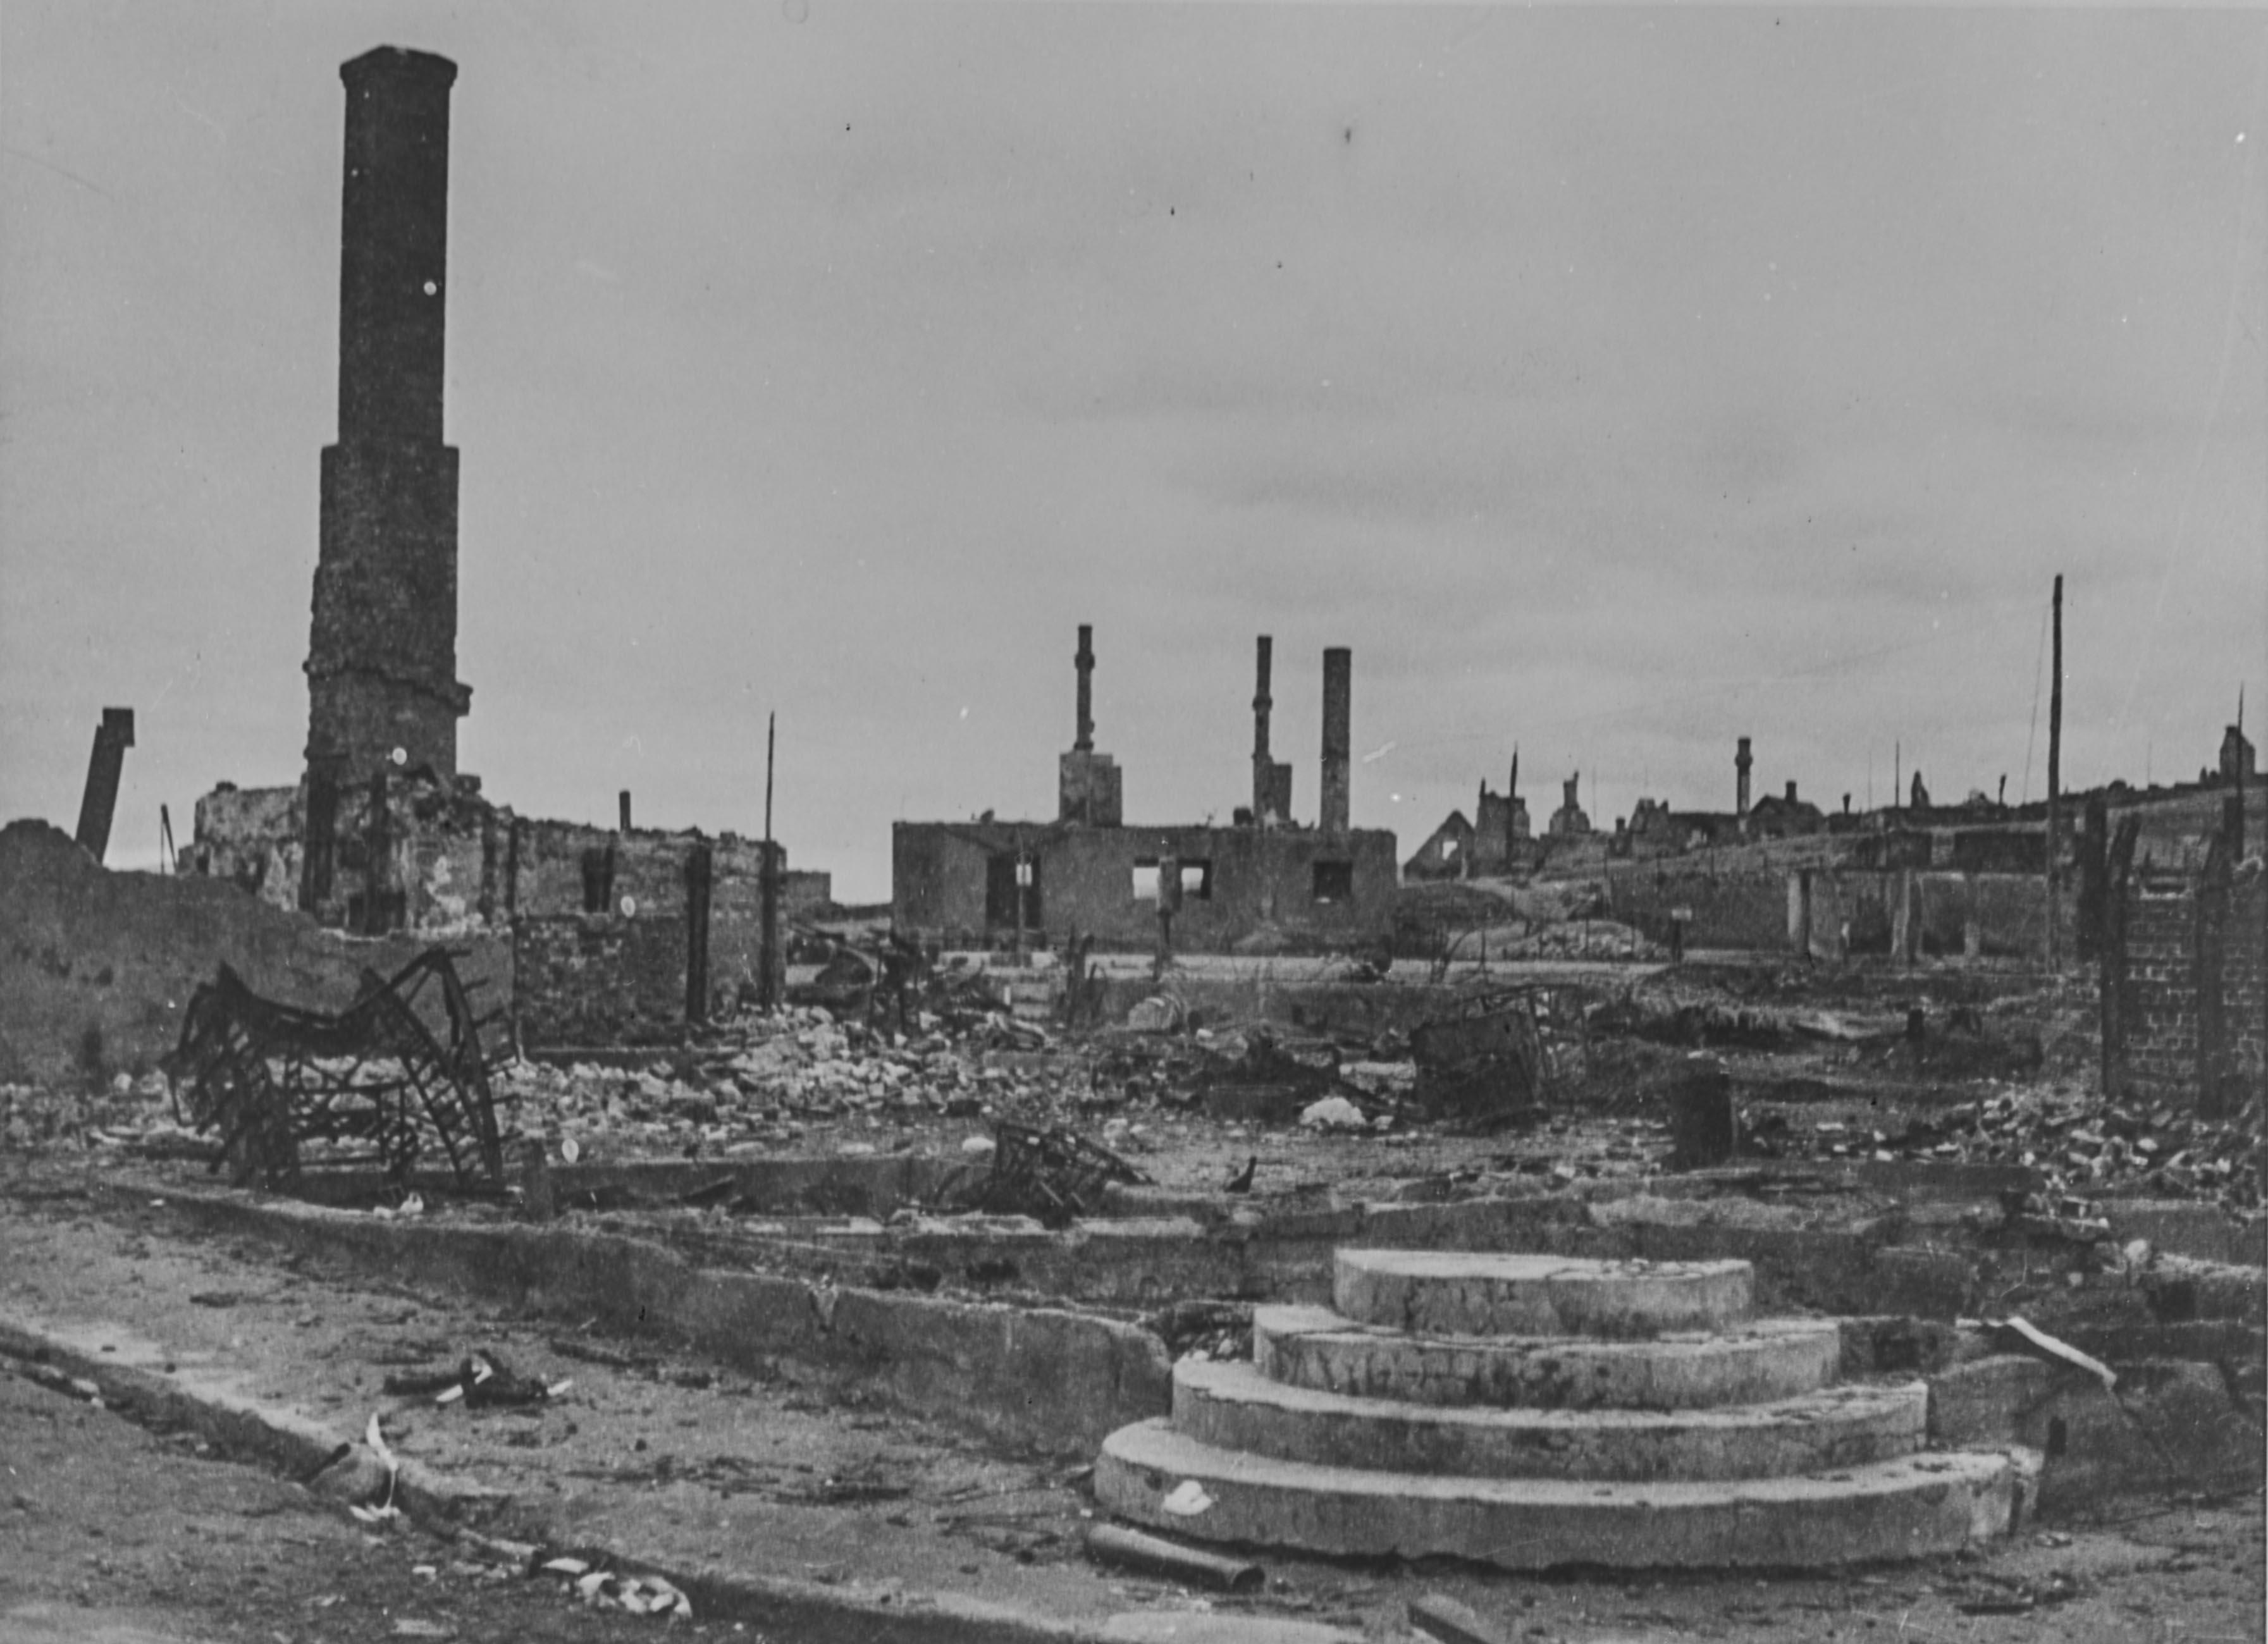 Nord-Norge i ruiner under tyskernes retrett